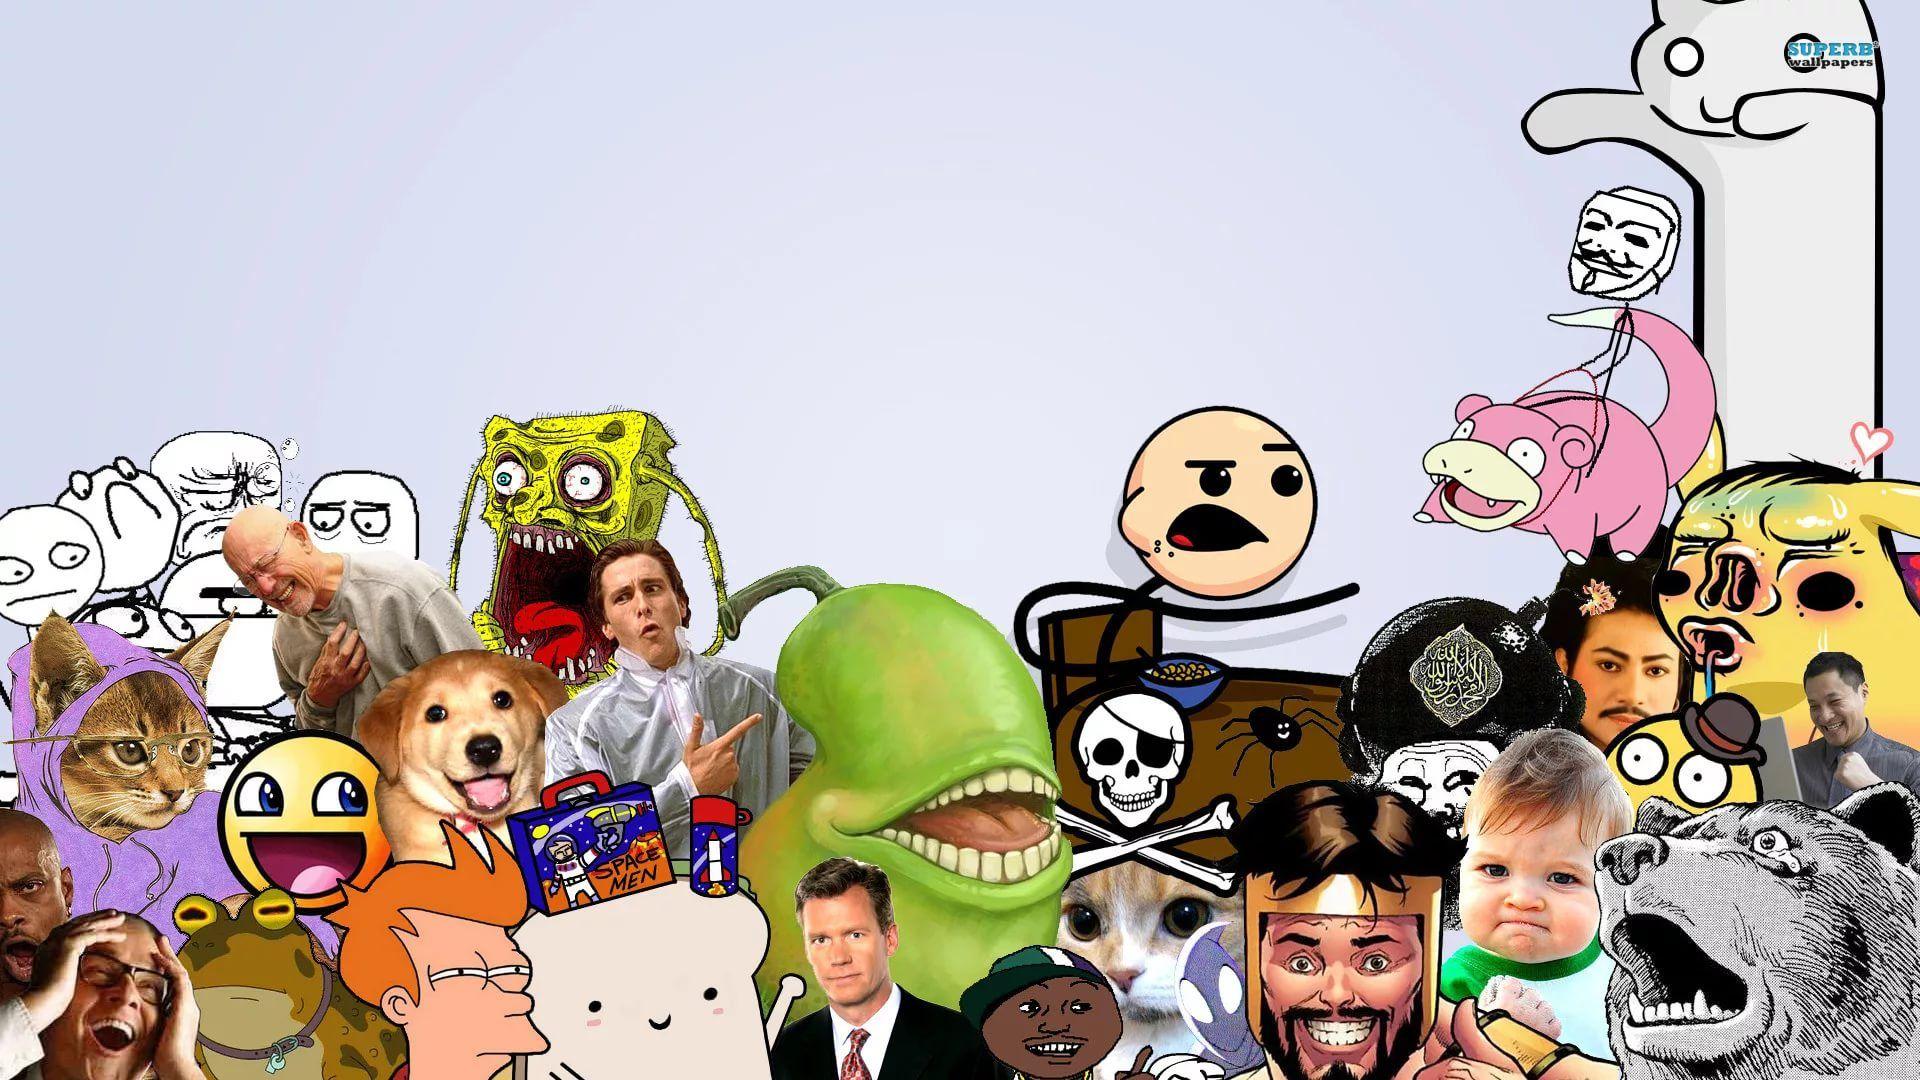 Meme Picture